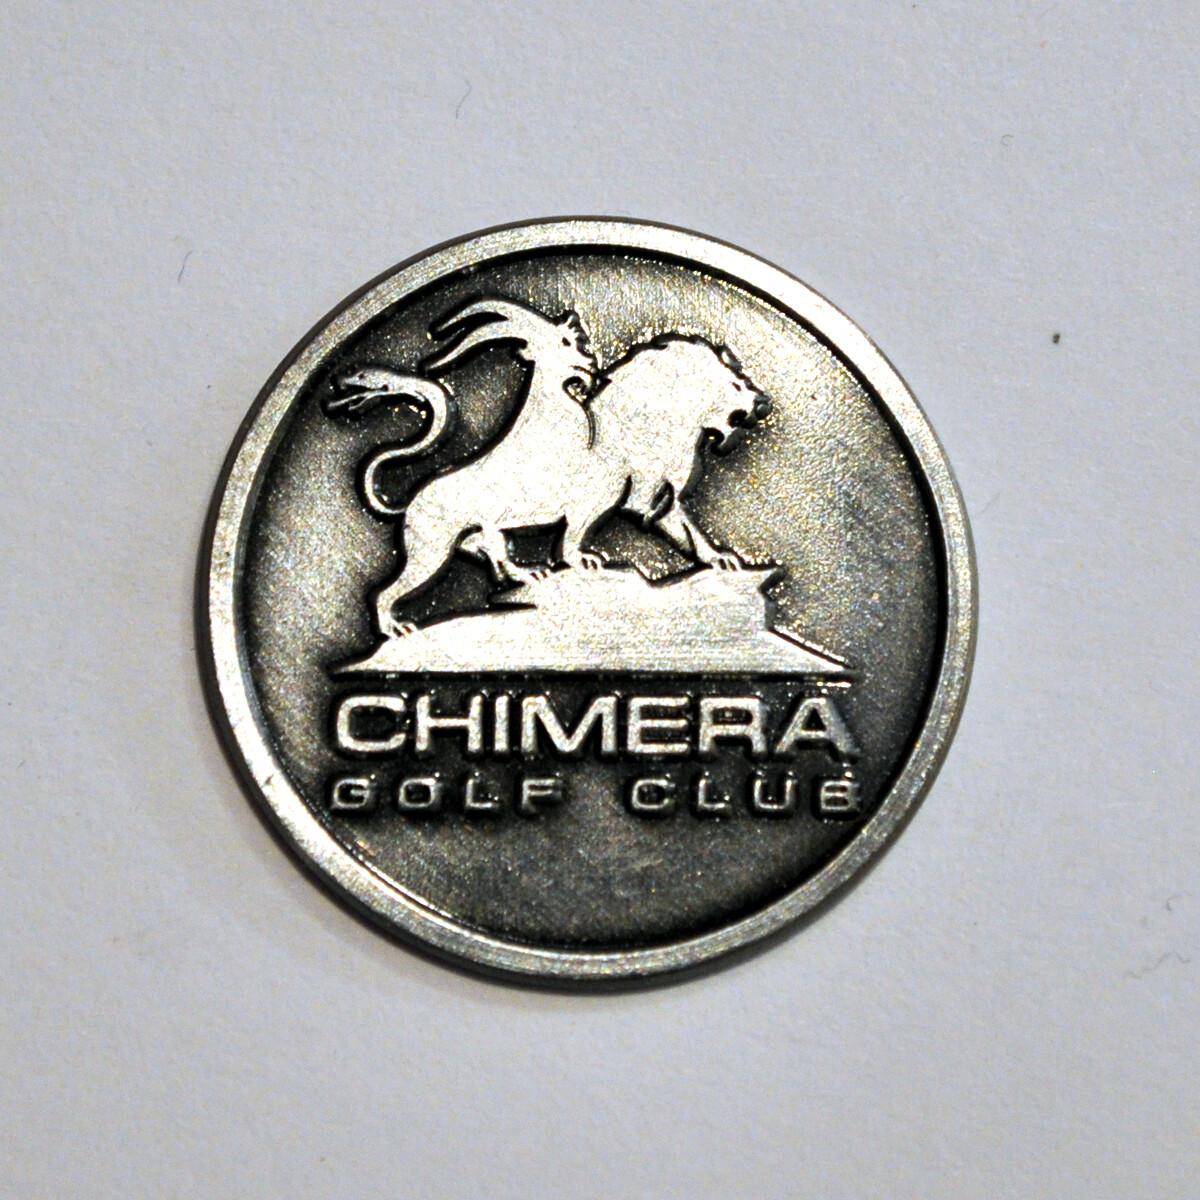 Ball Marker - Bare metal Chimera